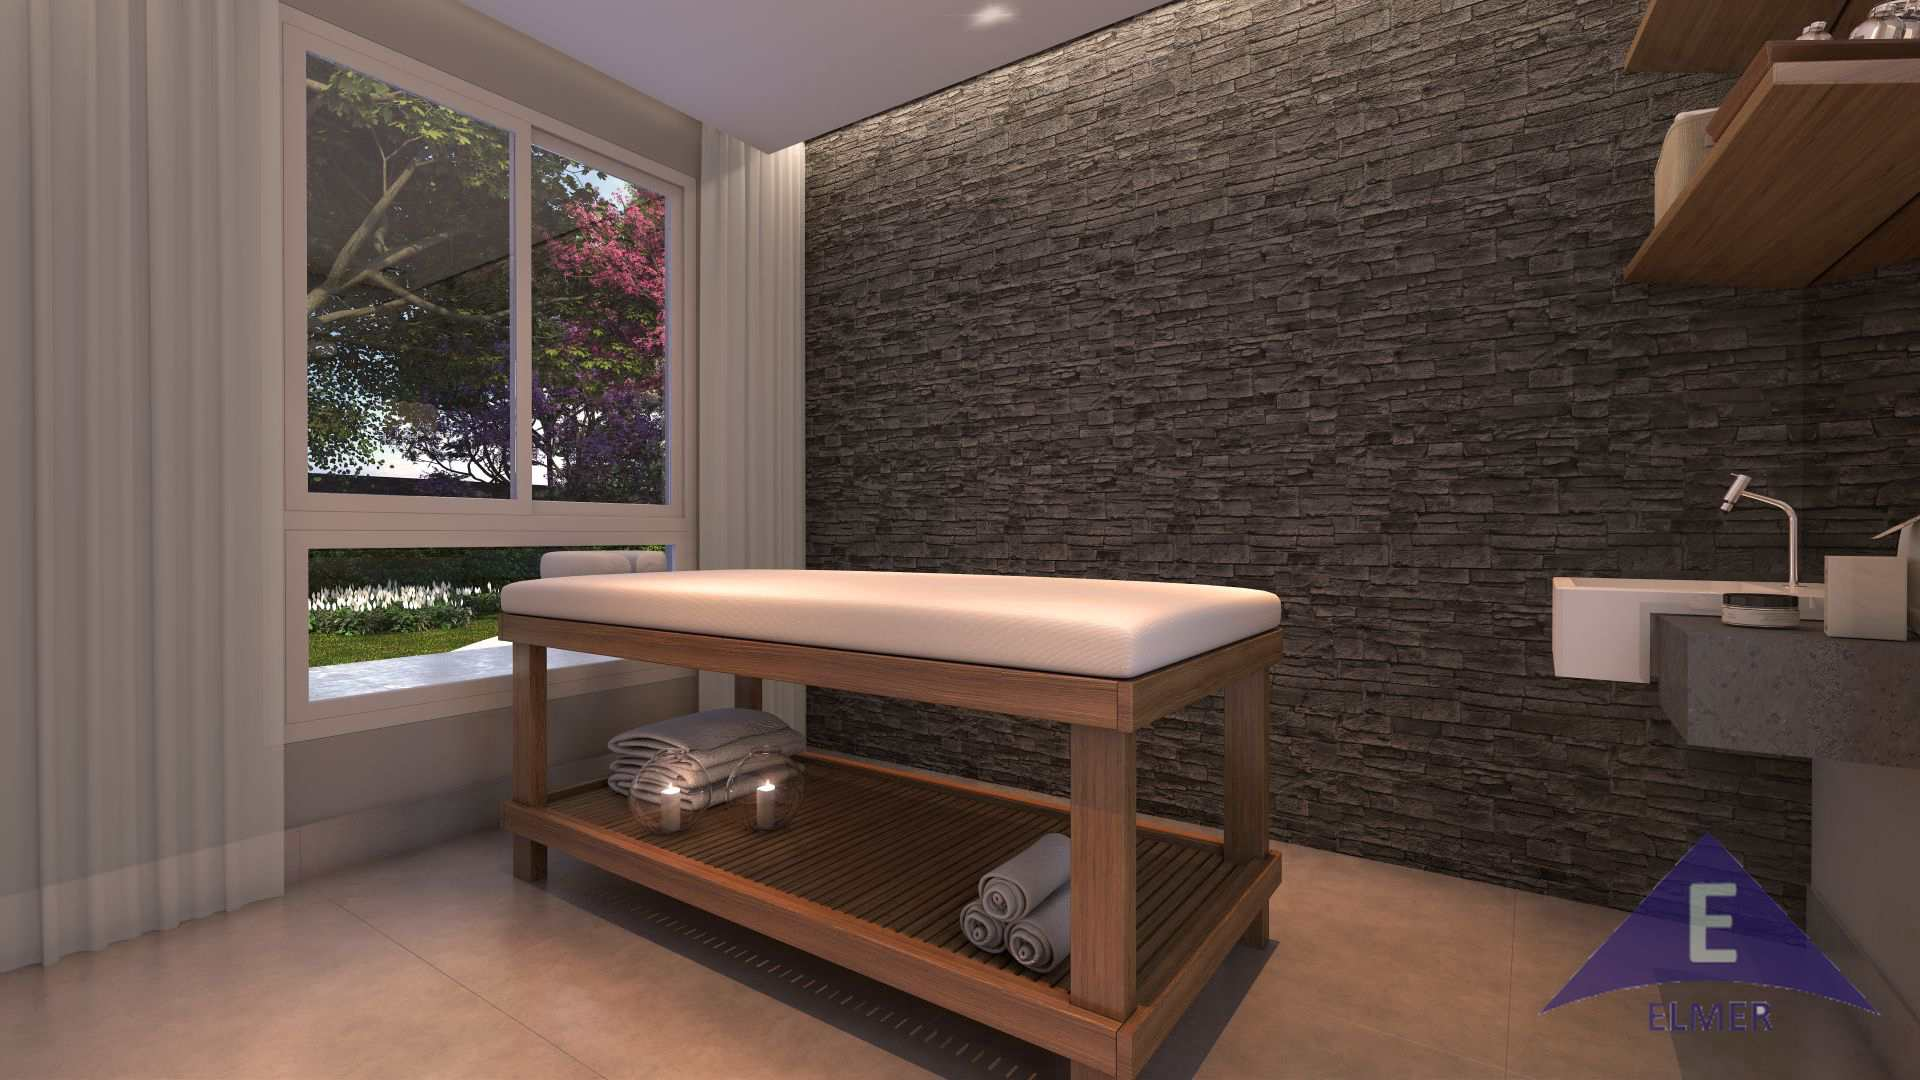 batch_Imagem-Ilustrativa-Sala-Massagem-Spa-Lounge-Torre-8-RA43-Raiz-SP